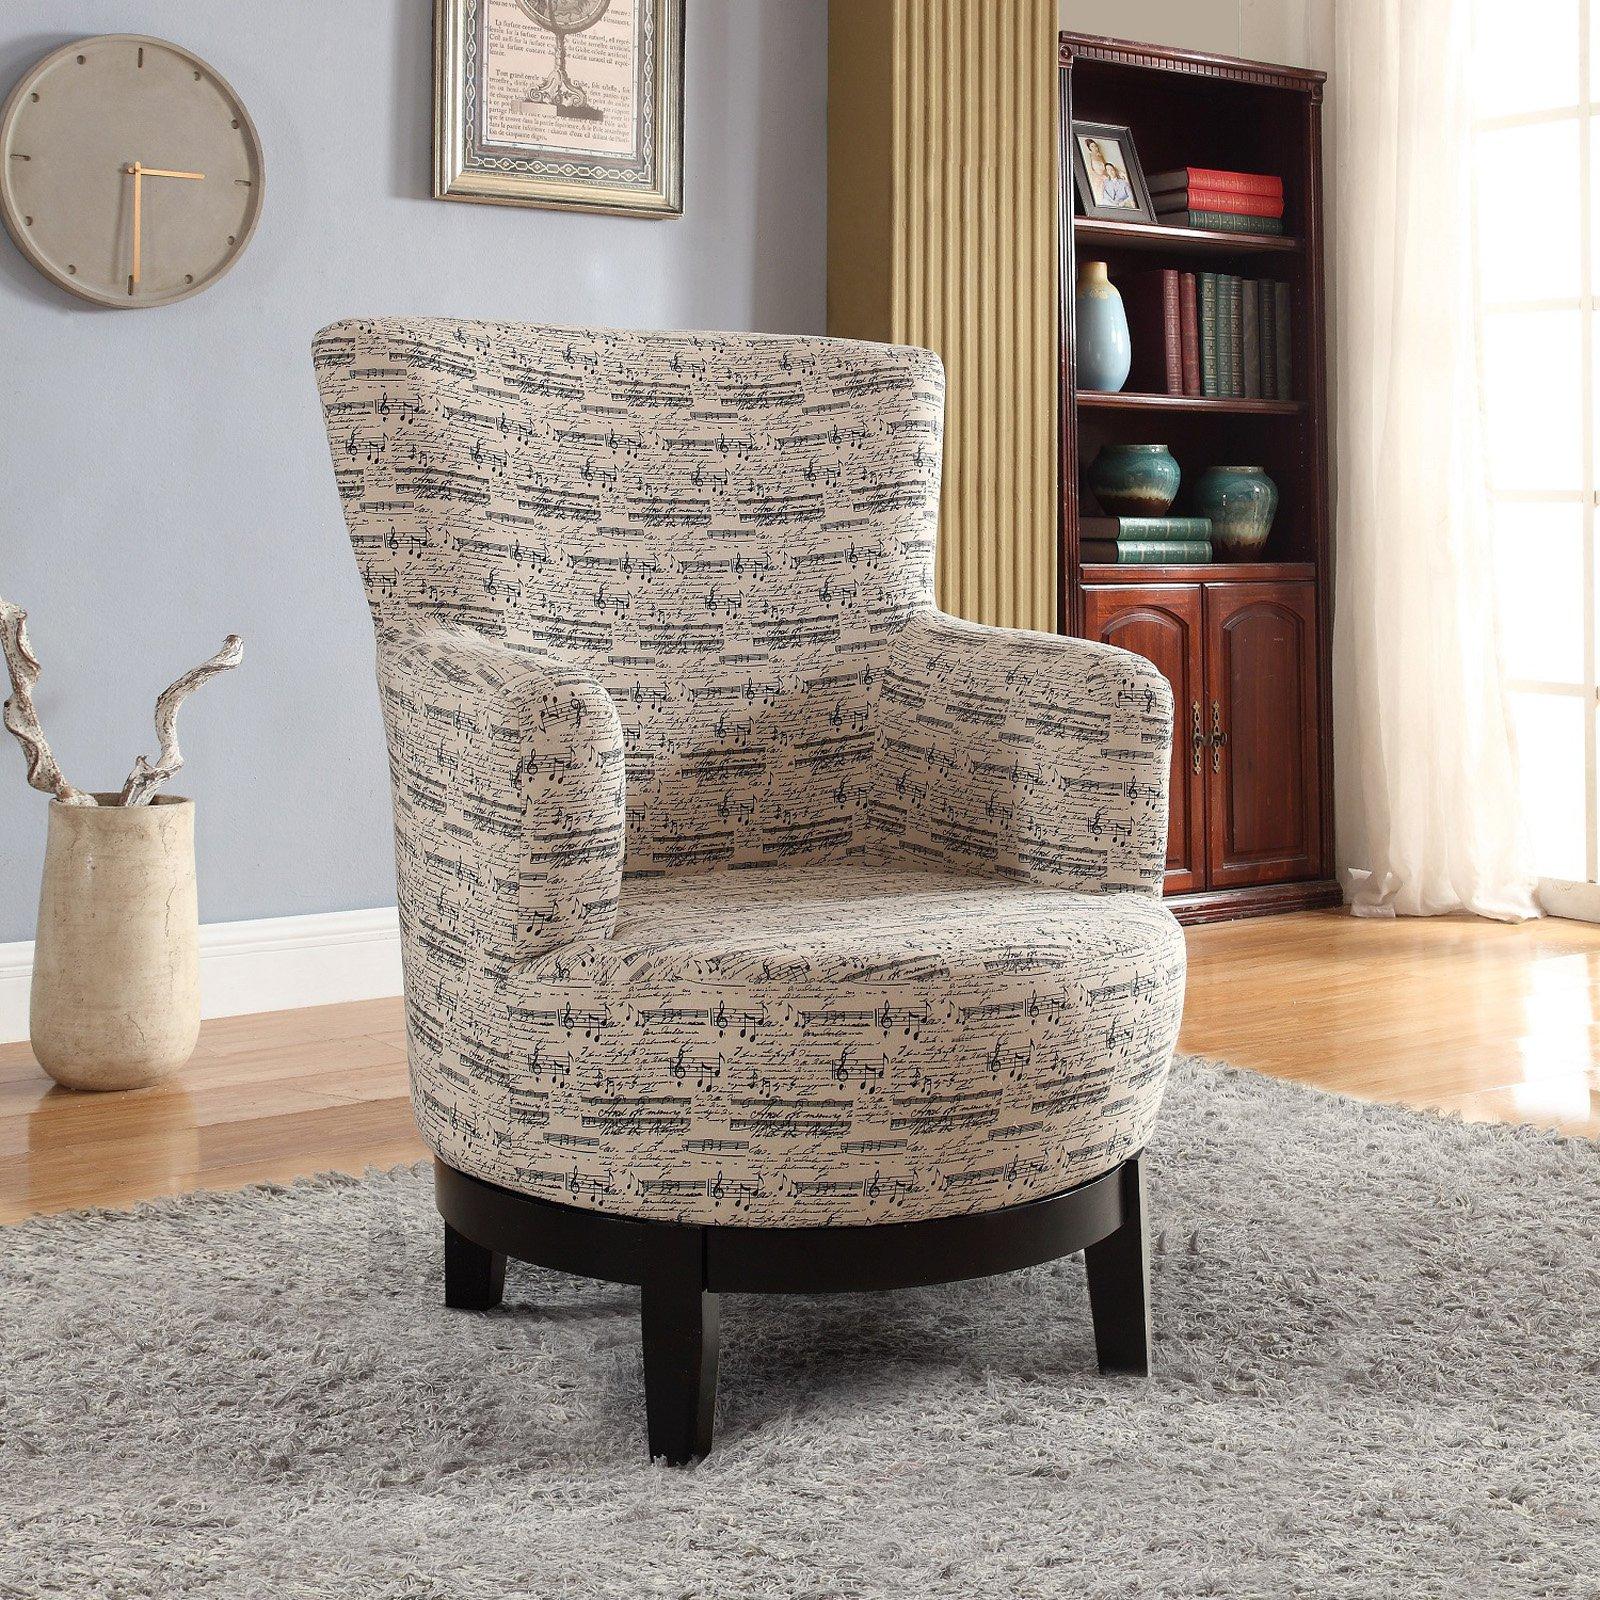 NH Designs Swivel Print Music Staff Accent Chair